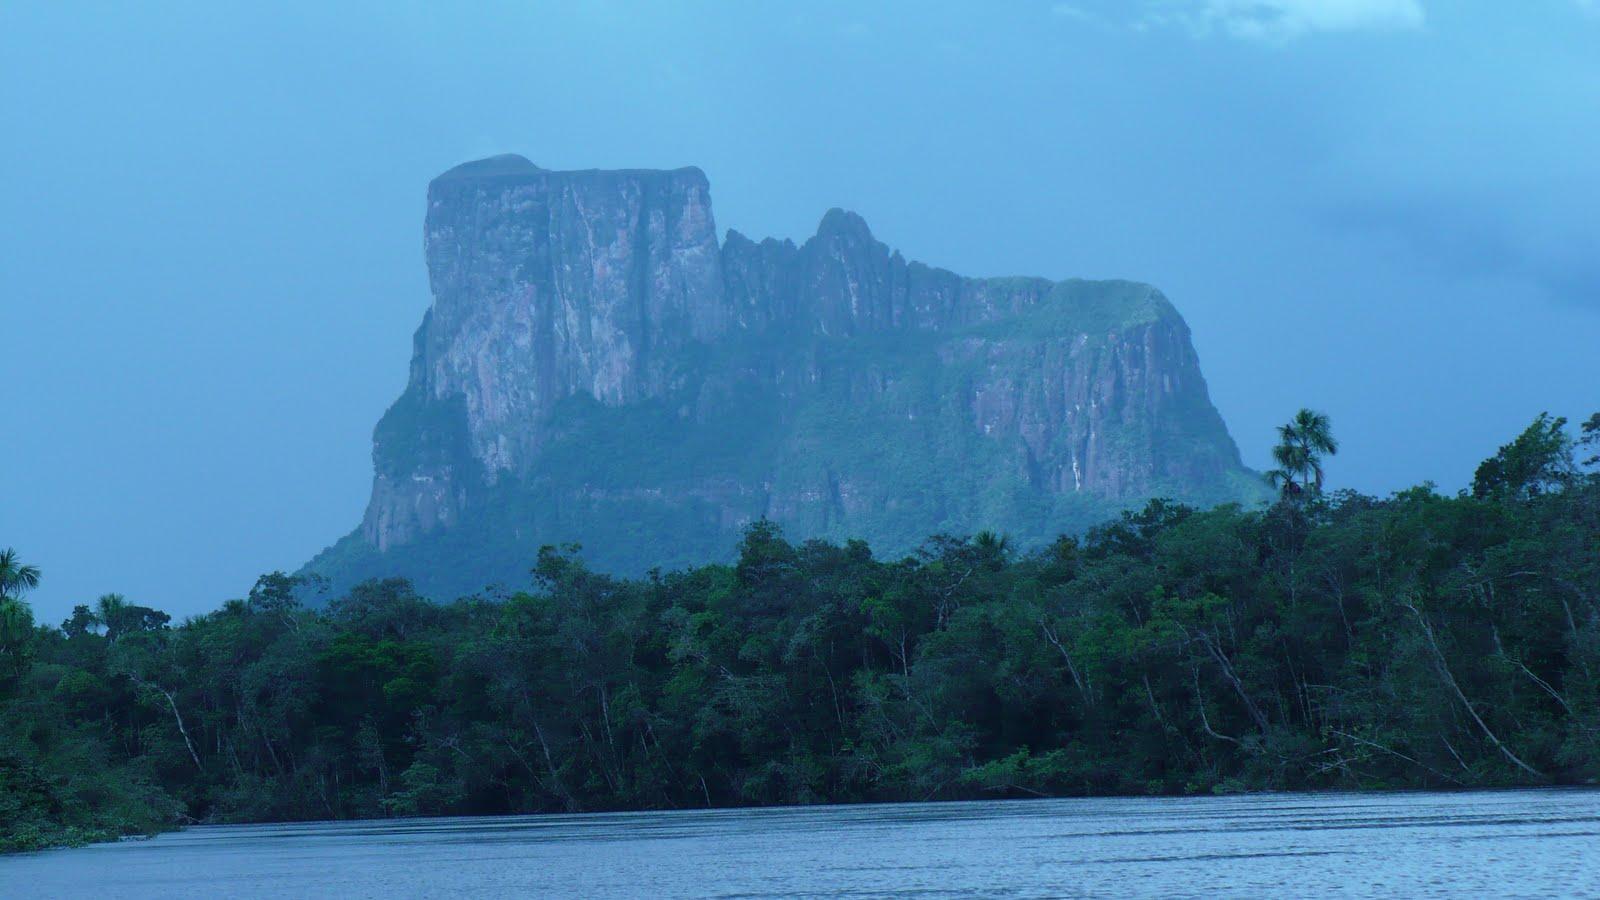 Las 7 Maravillas Geolgicas de Venezuela  Geologa Venezolana